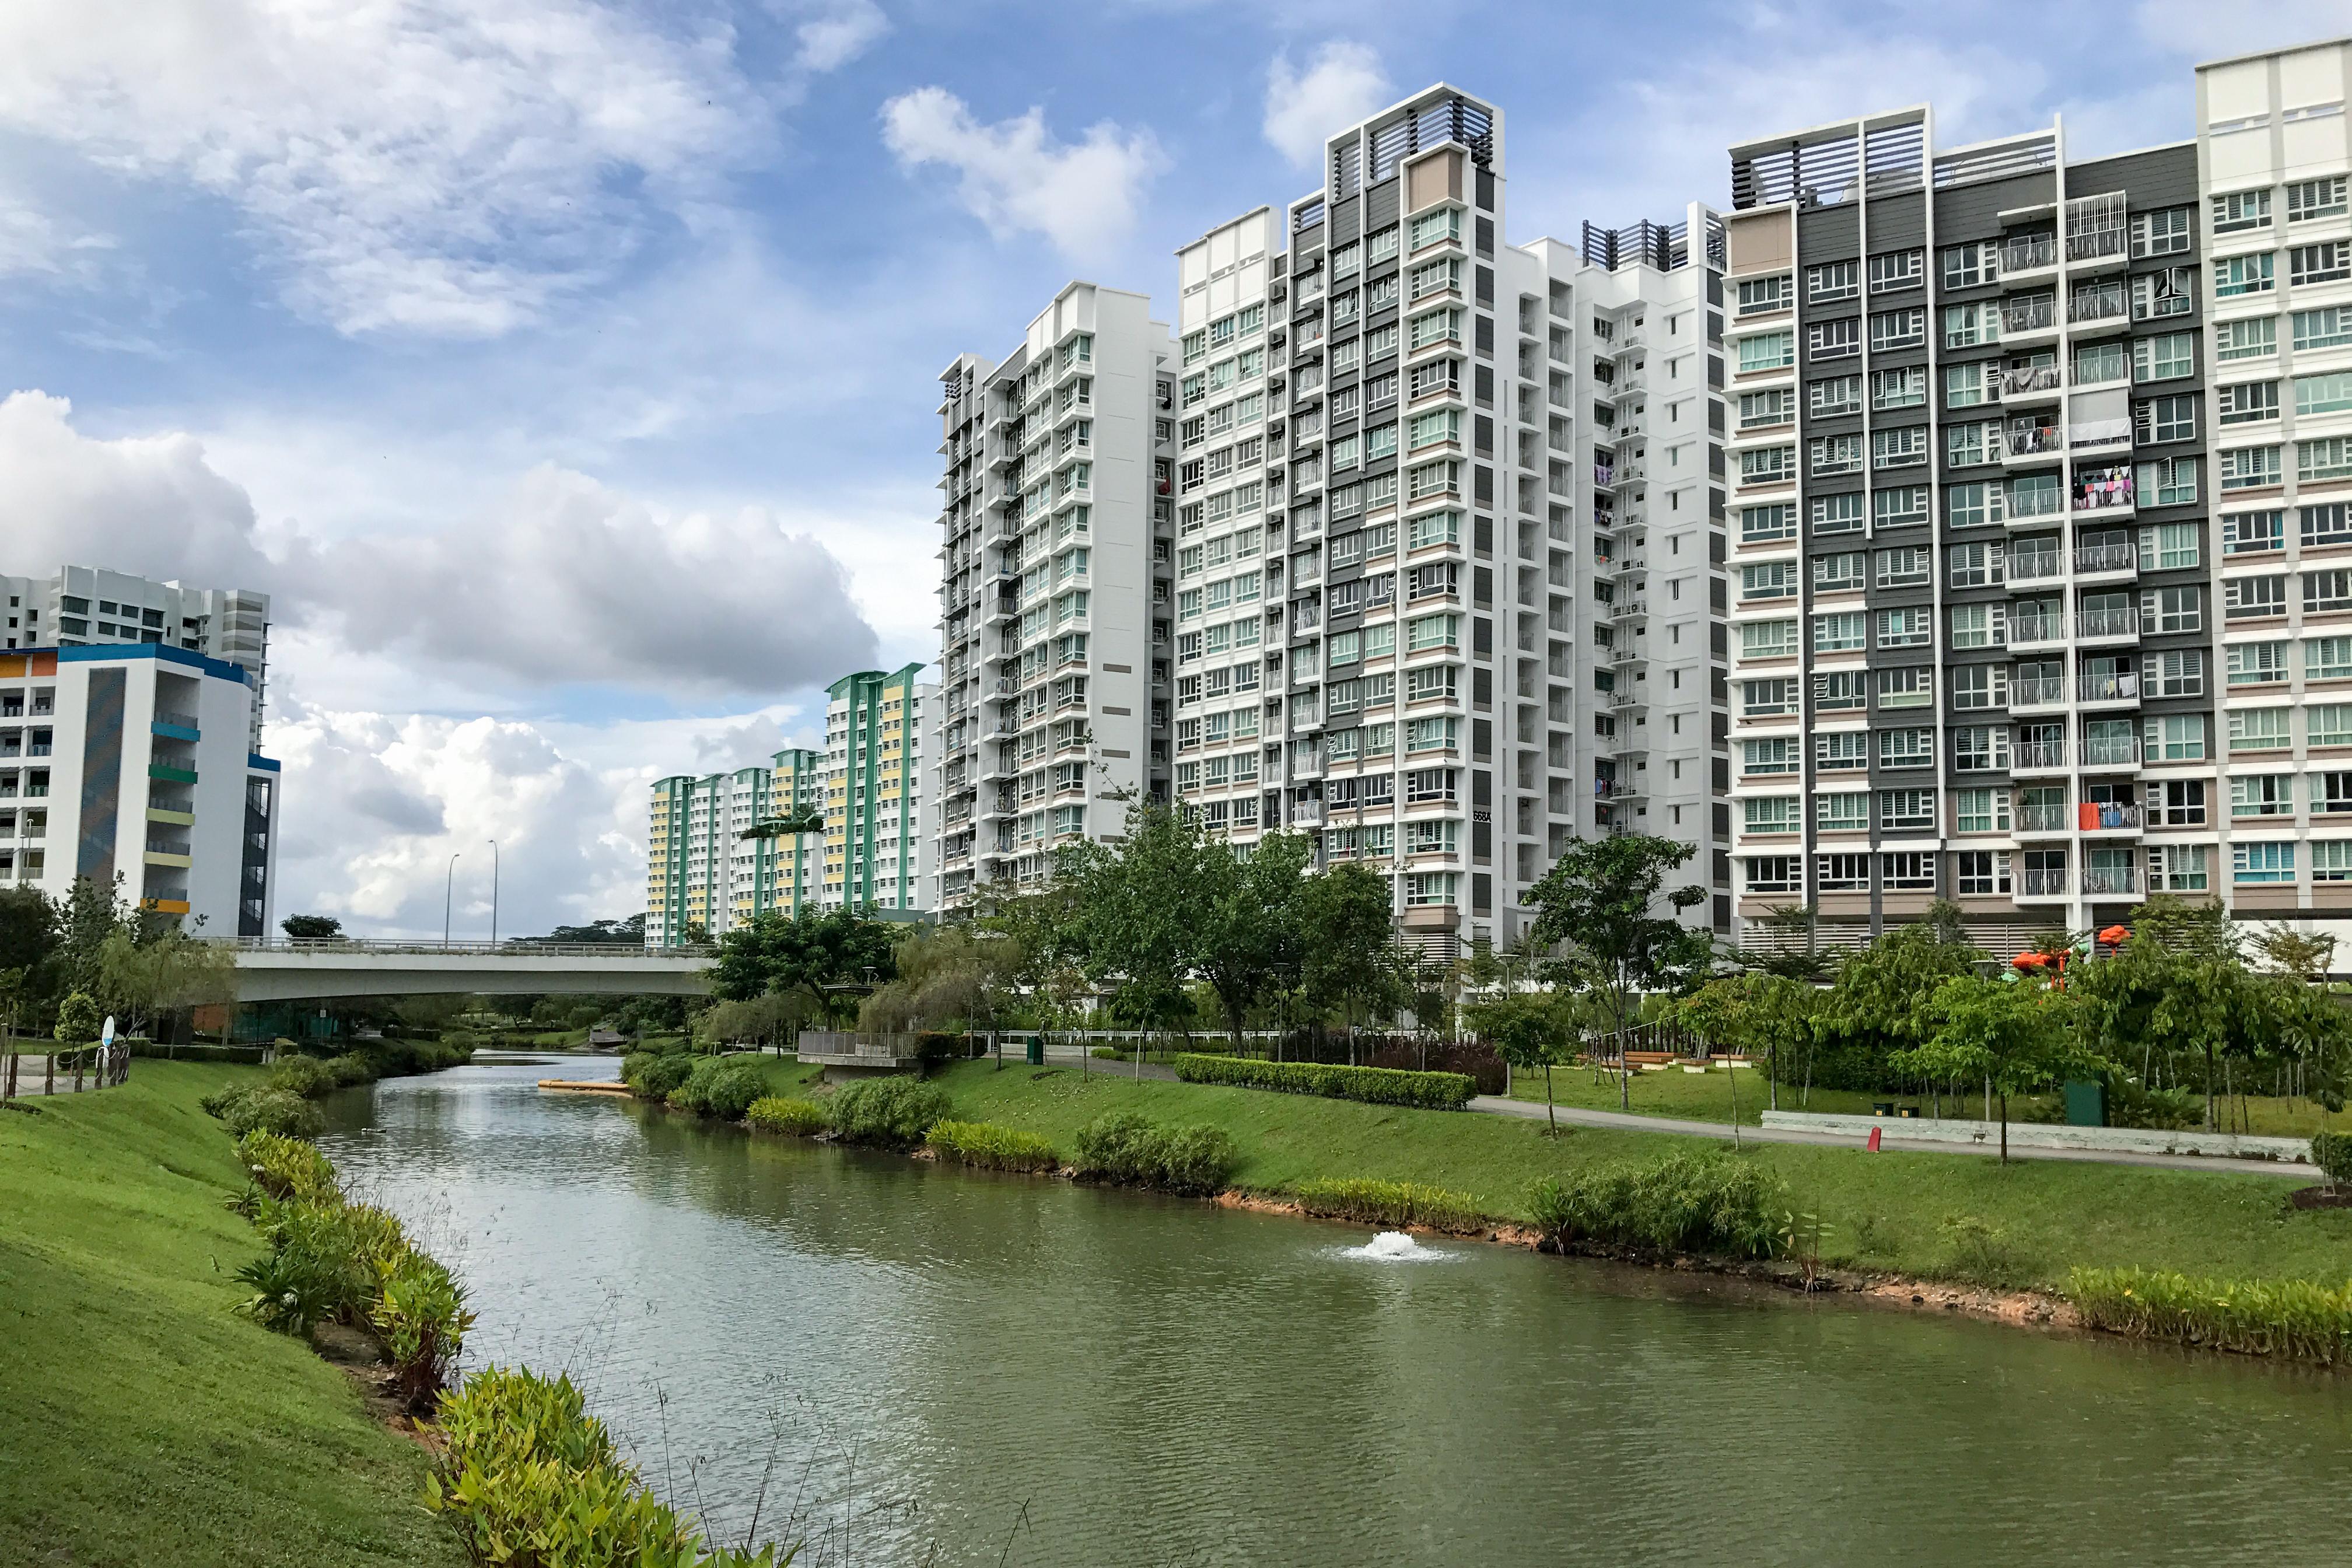 EHG - Enhanced CPF Housing Grant 1